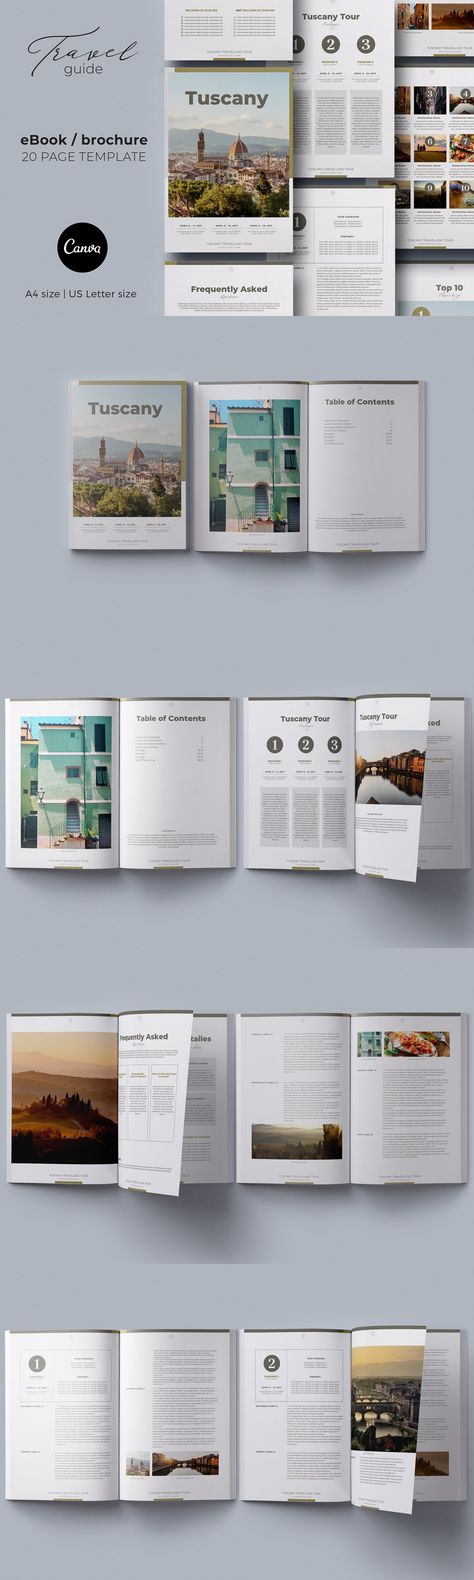 Canva eBook / Brochure Travel Guide